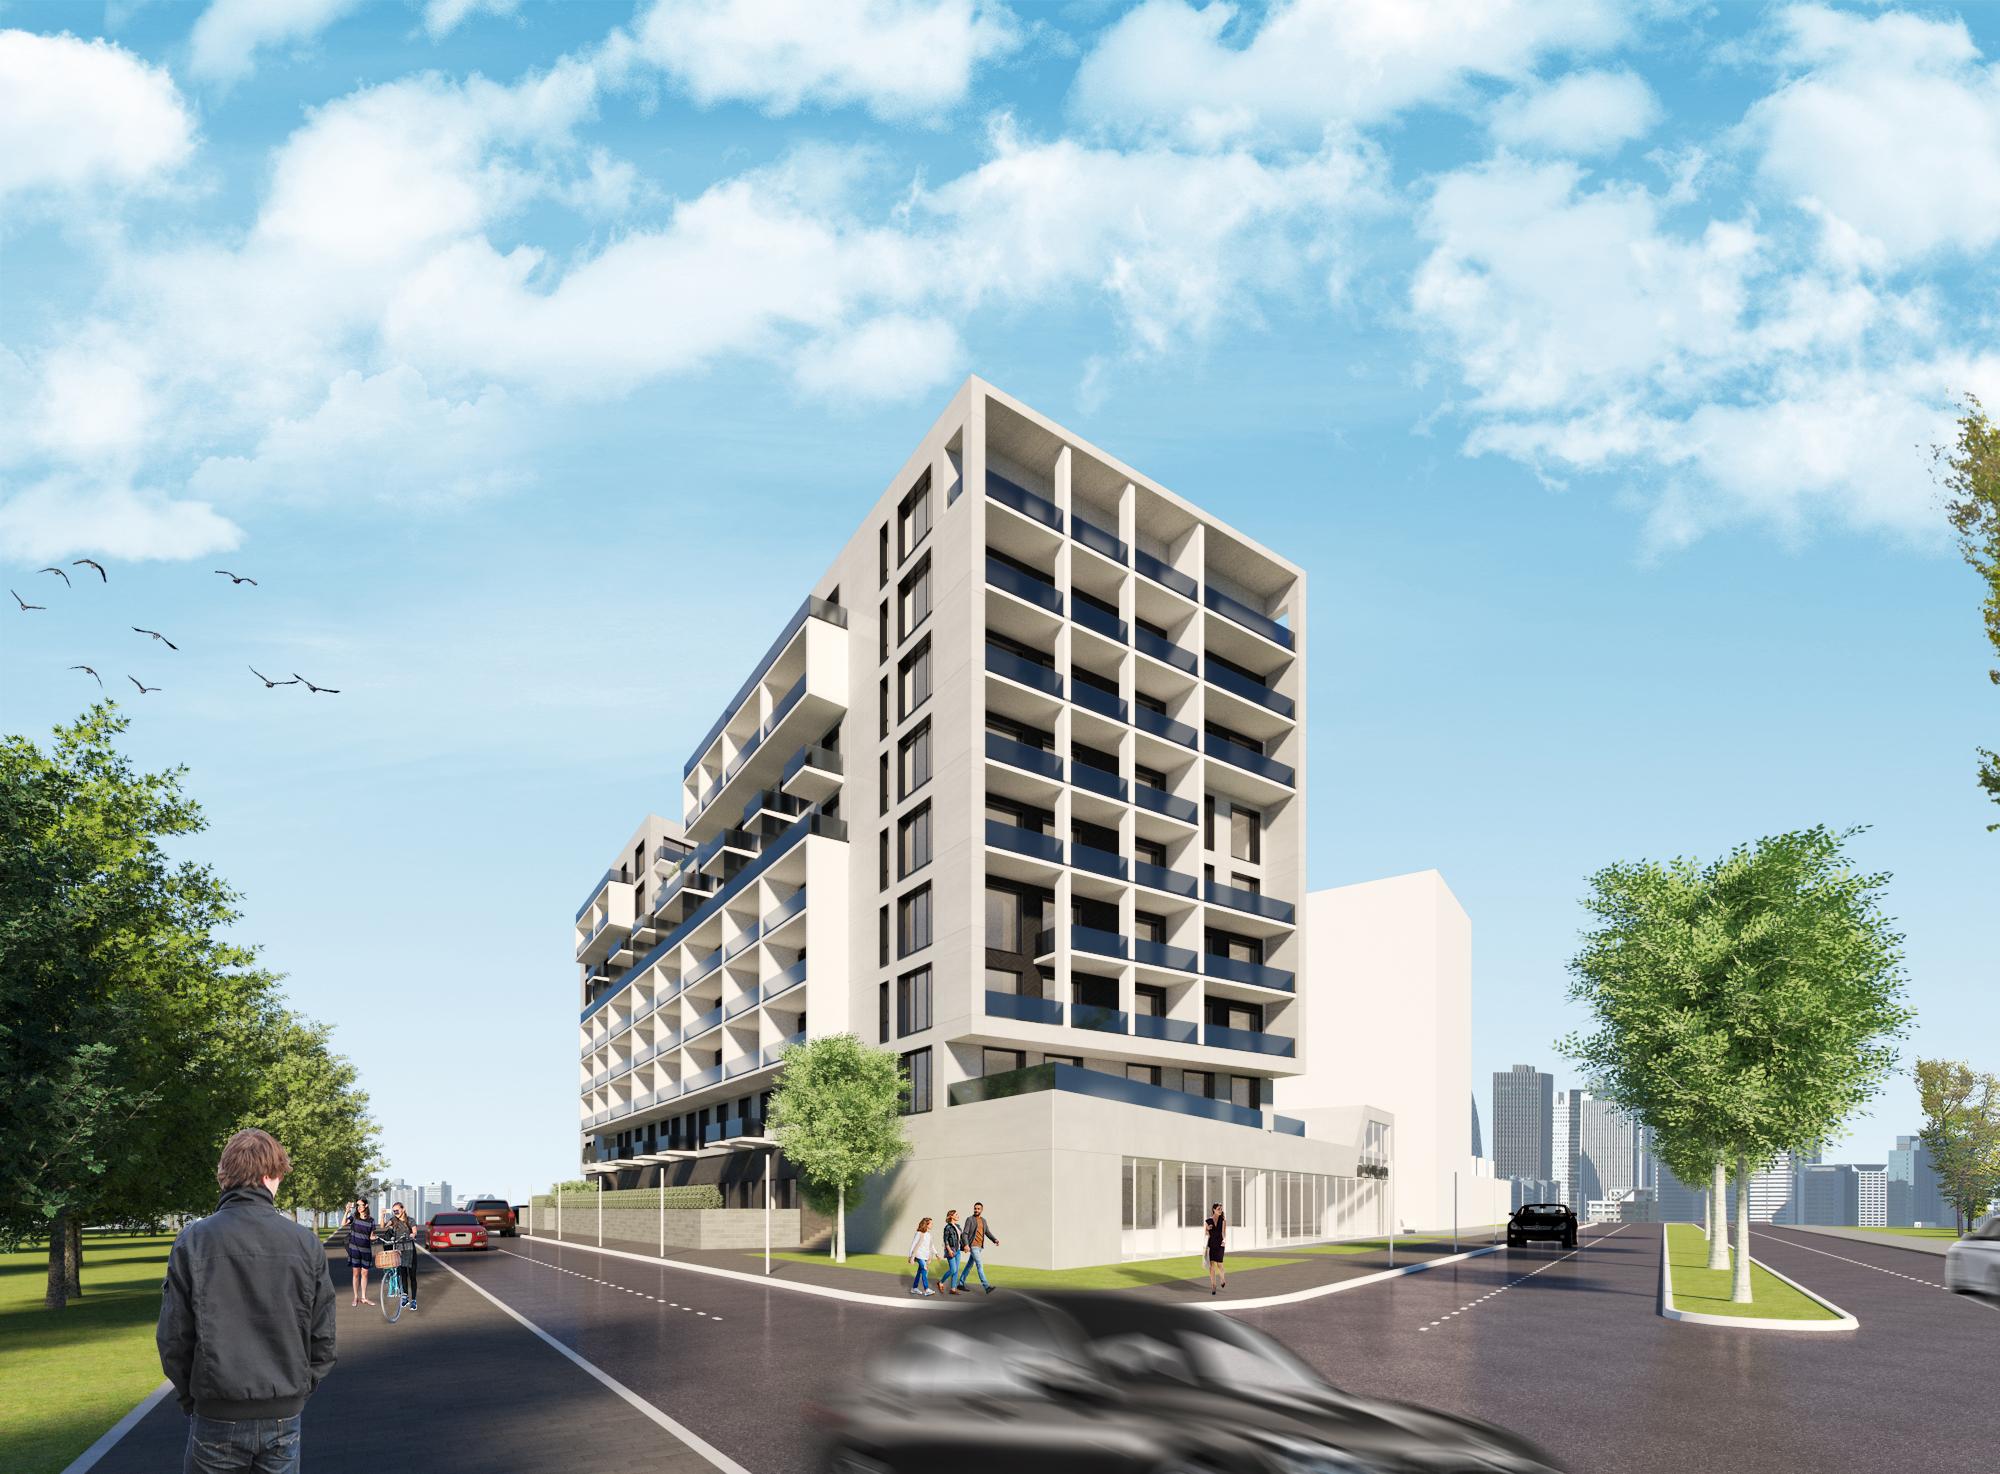 https://nbc-arhitect.ro/wp-content/uploads/2020/10/NBC-Arhitect-_-residentials-_-Glucoza-Residence-2-_-Bucharest-Romania_3.jpg